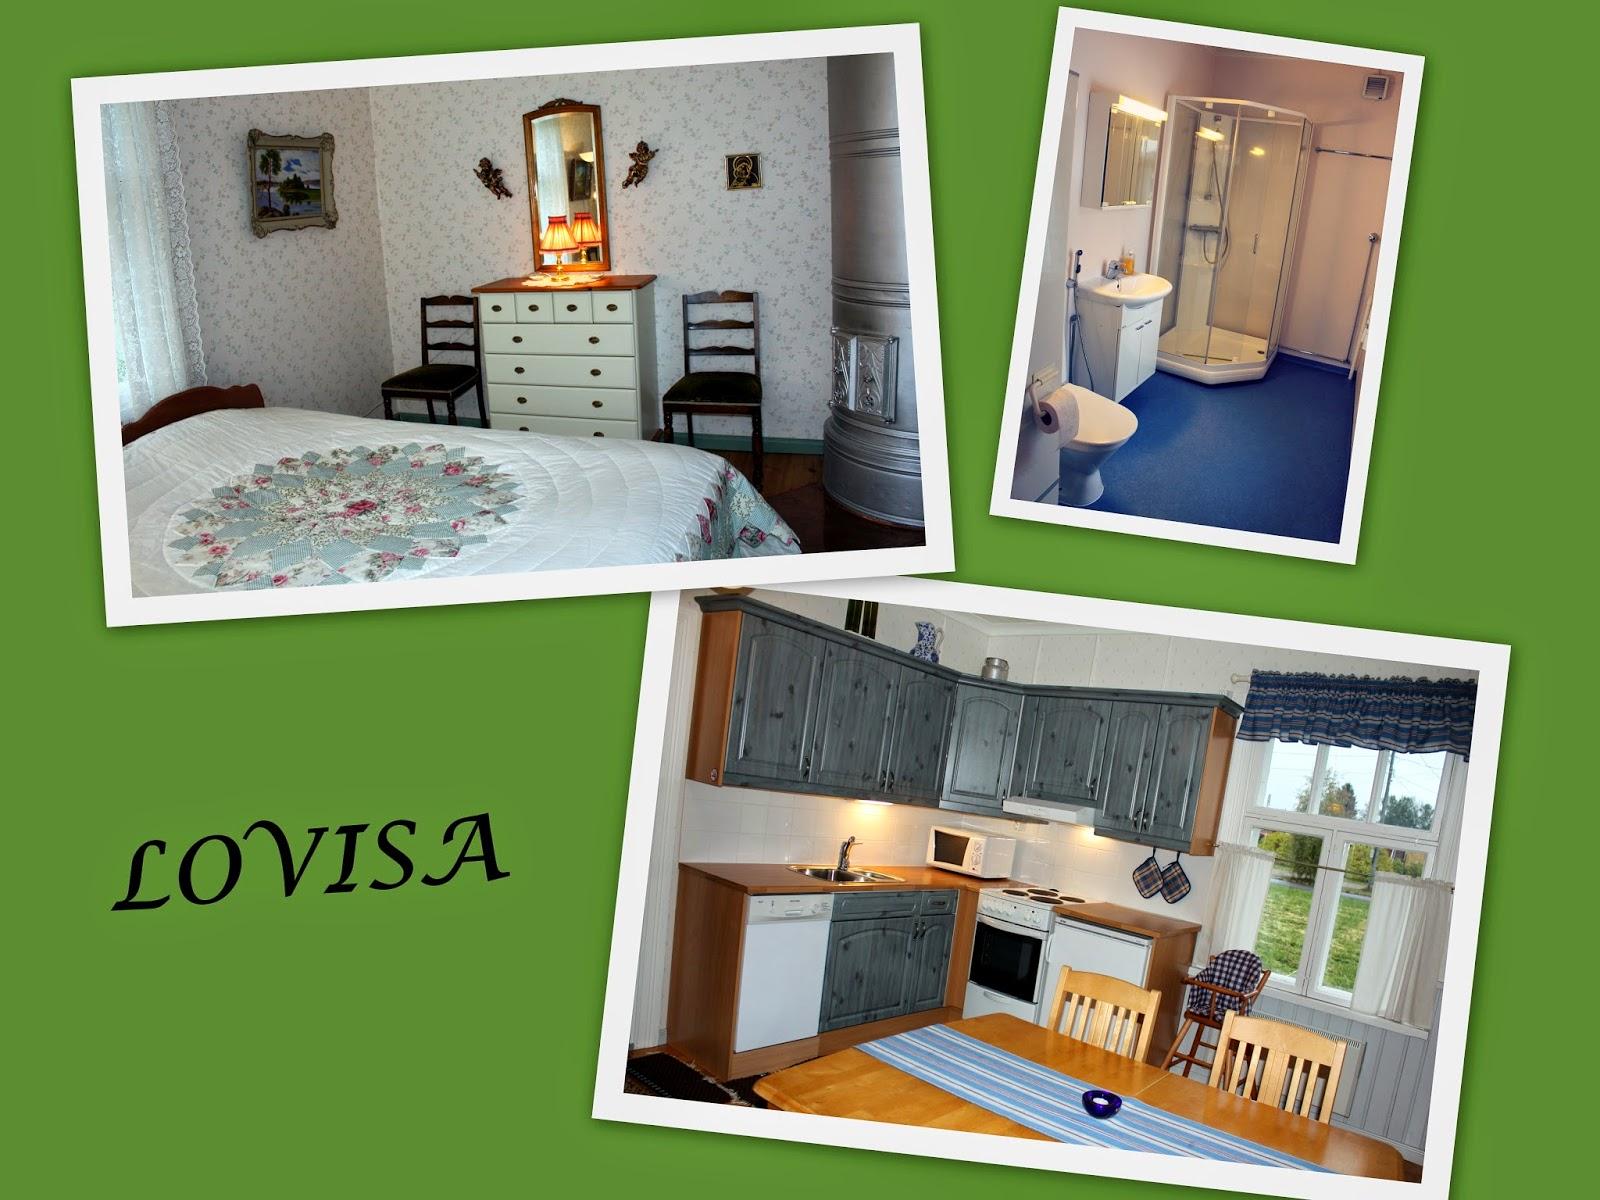 Jepuan vierasmökit jeppo gäststugor guesthouses ferienhauser